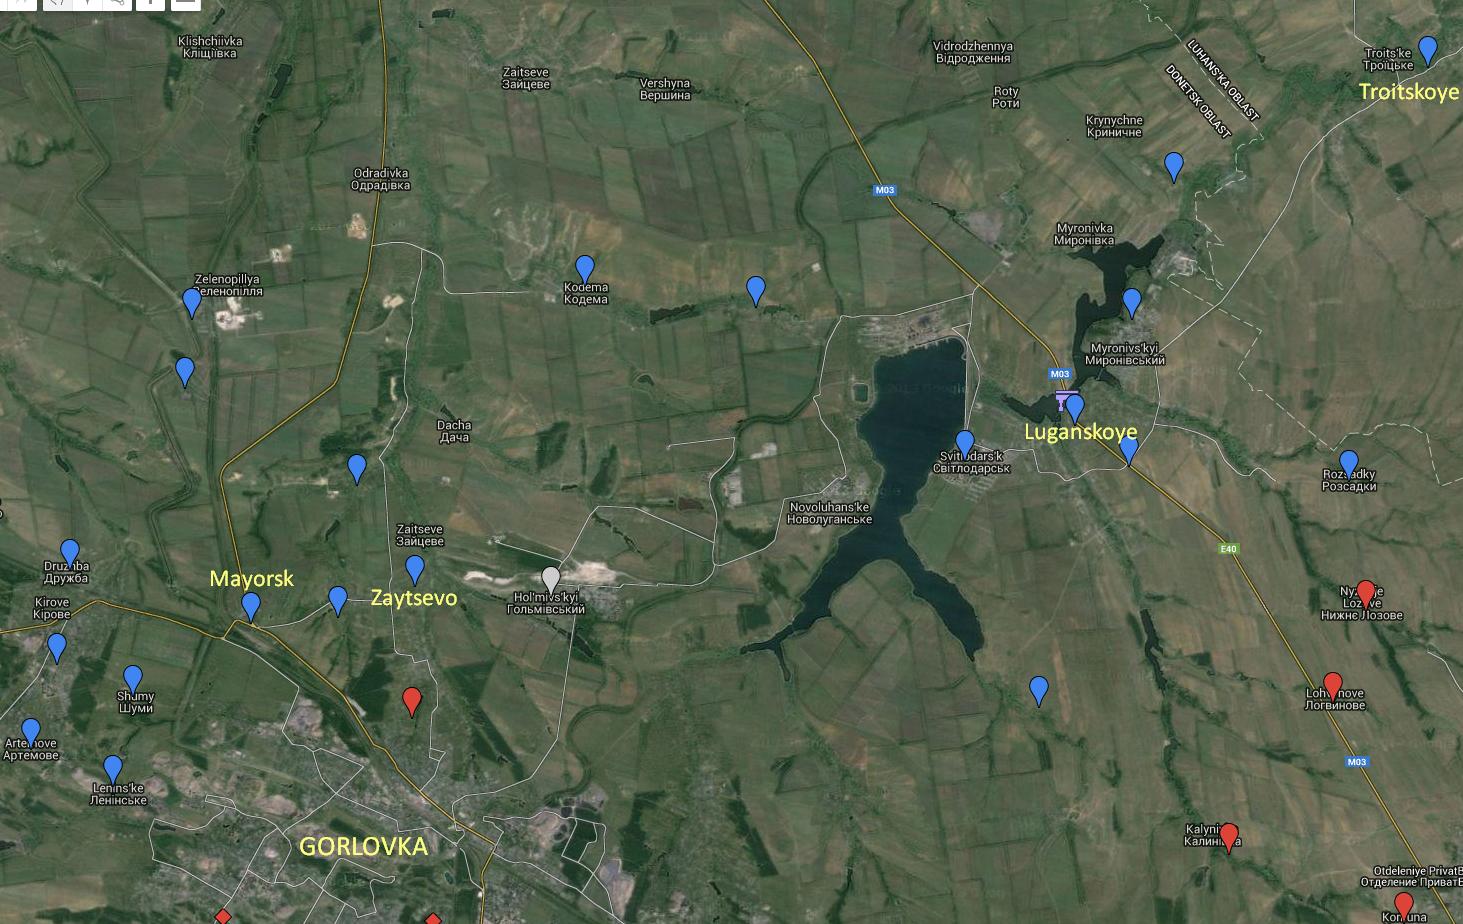 160209-gorlovka-map.png